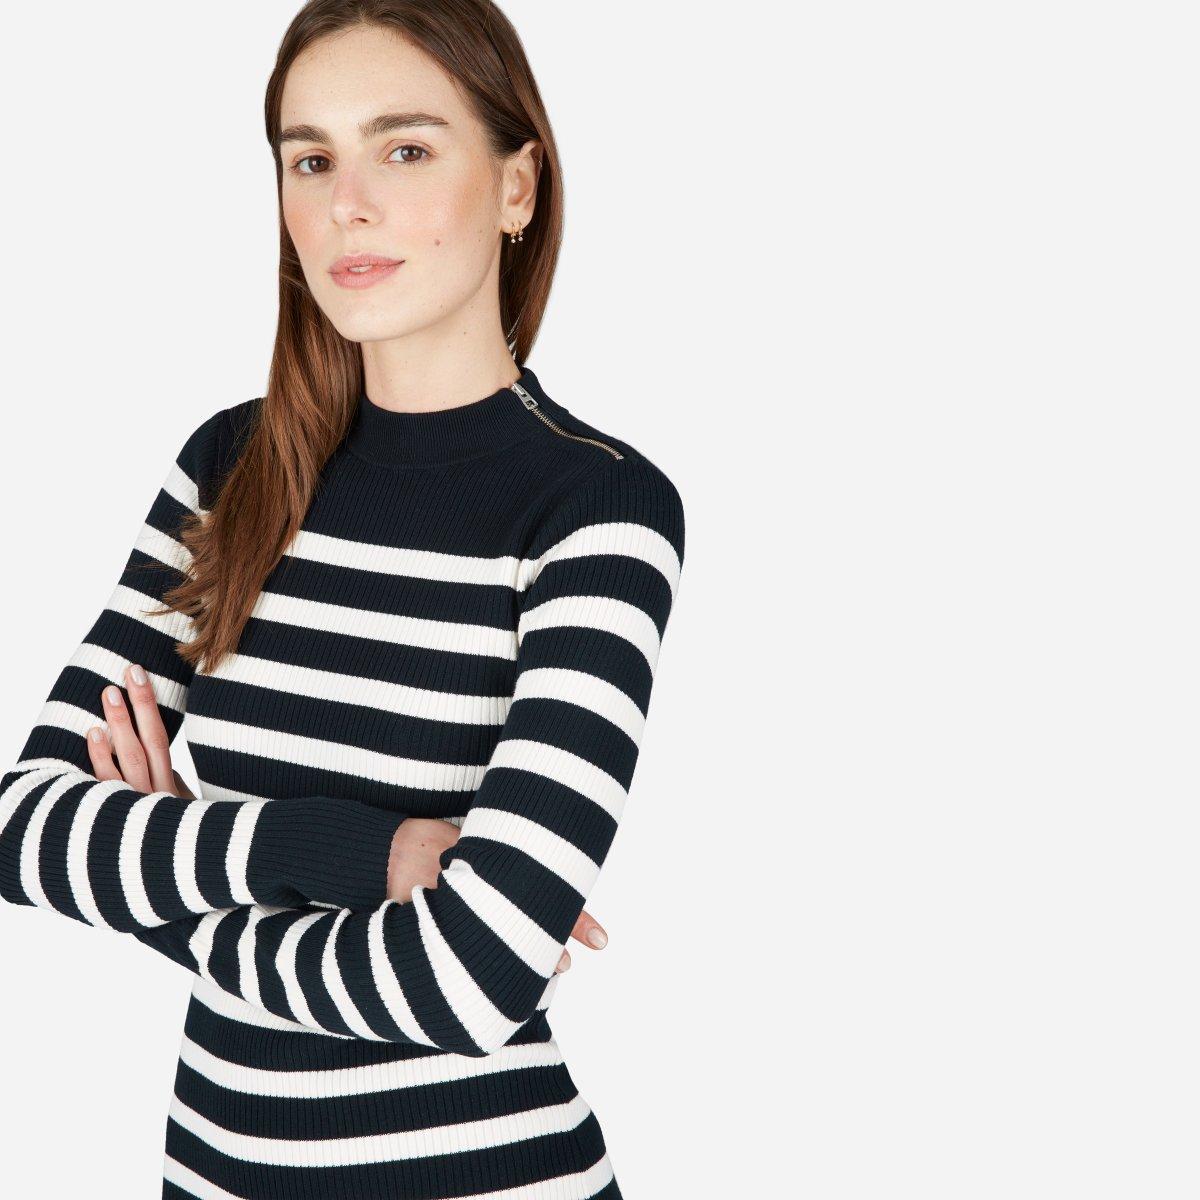 dcb0a93b61b4 Women's Breton Ribbed Cotton Sweater Dress | Everlane